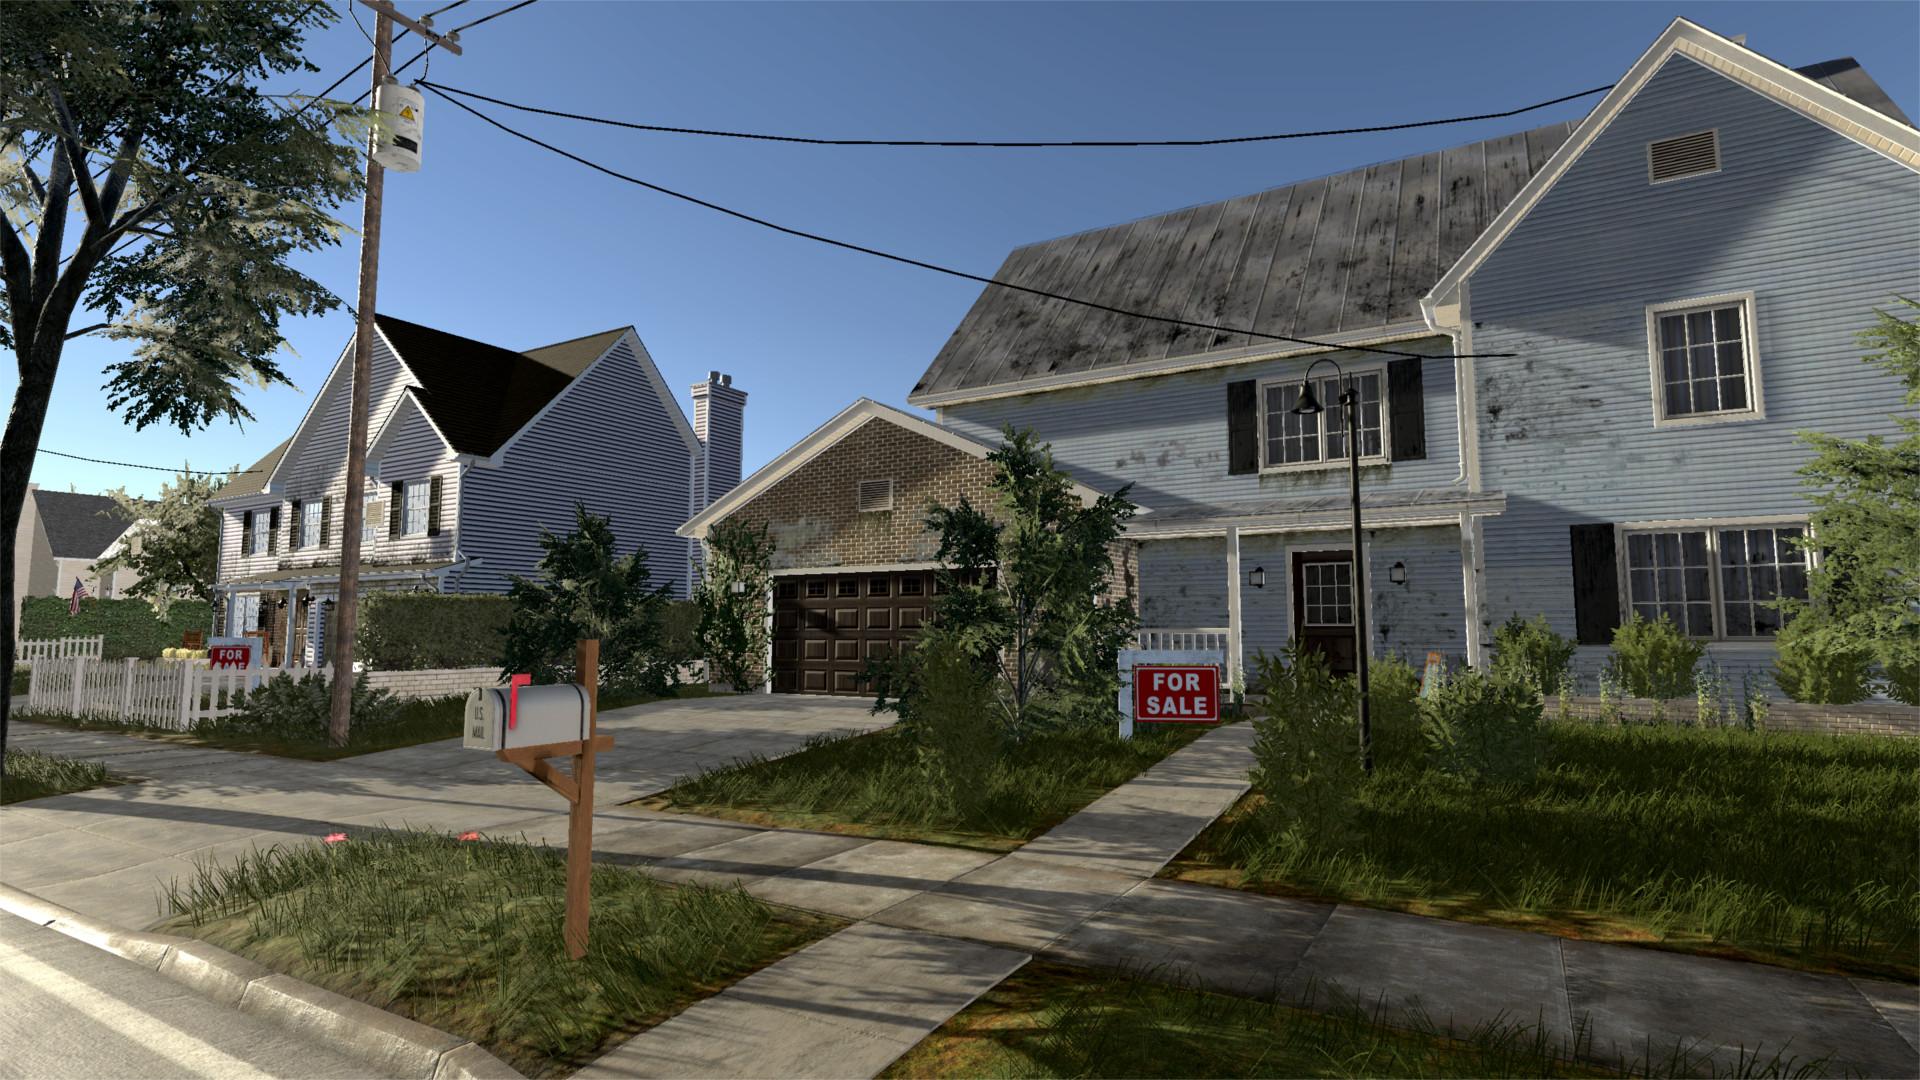 House Flipper Windows Mac Linux Game Indie Db